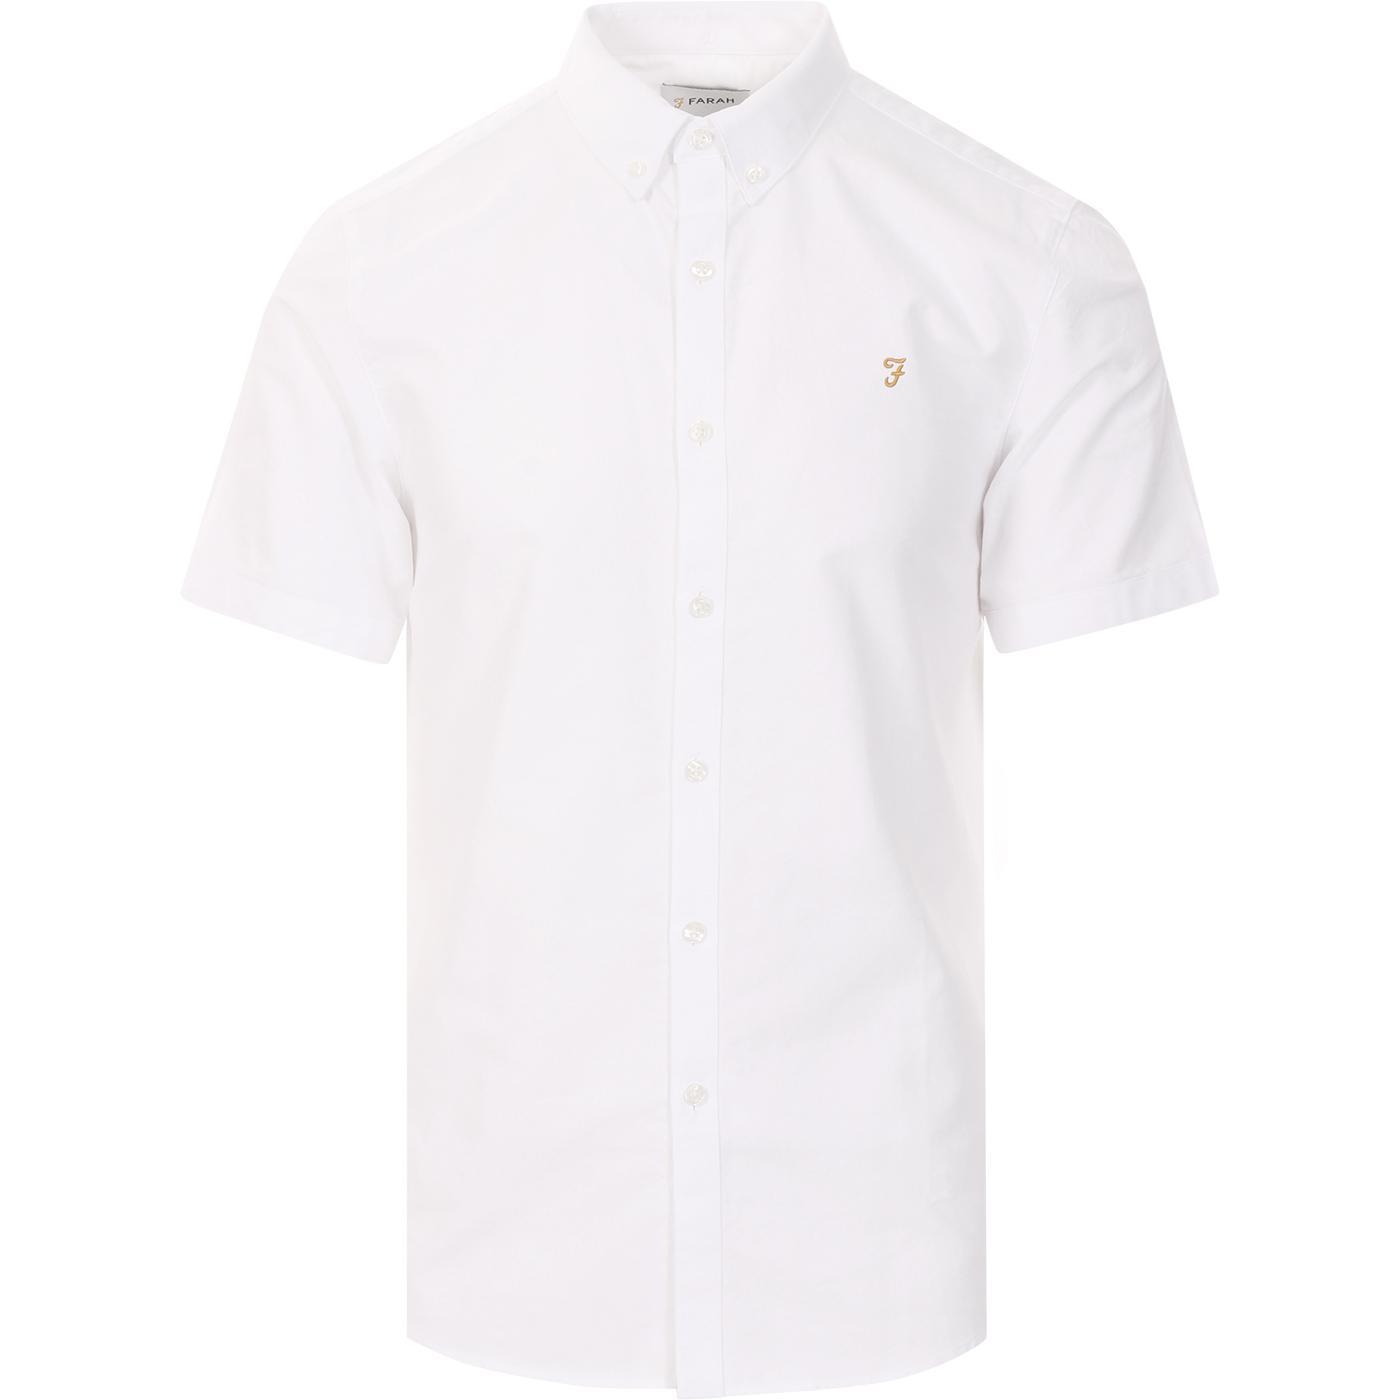 Brewer FARAH Slim Fit Mod Oxford S/S Shirt WHITE